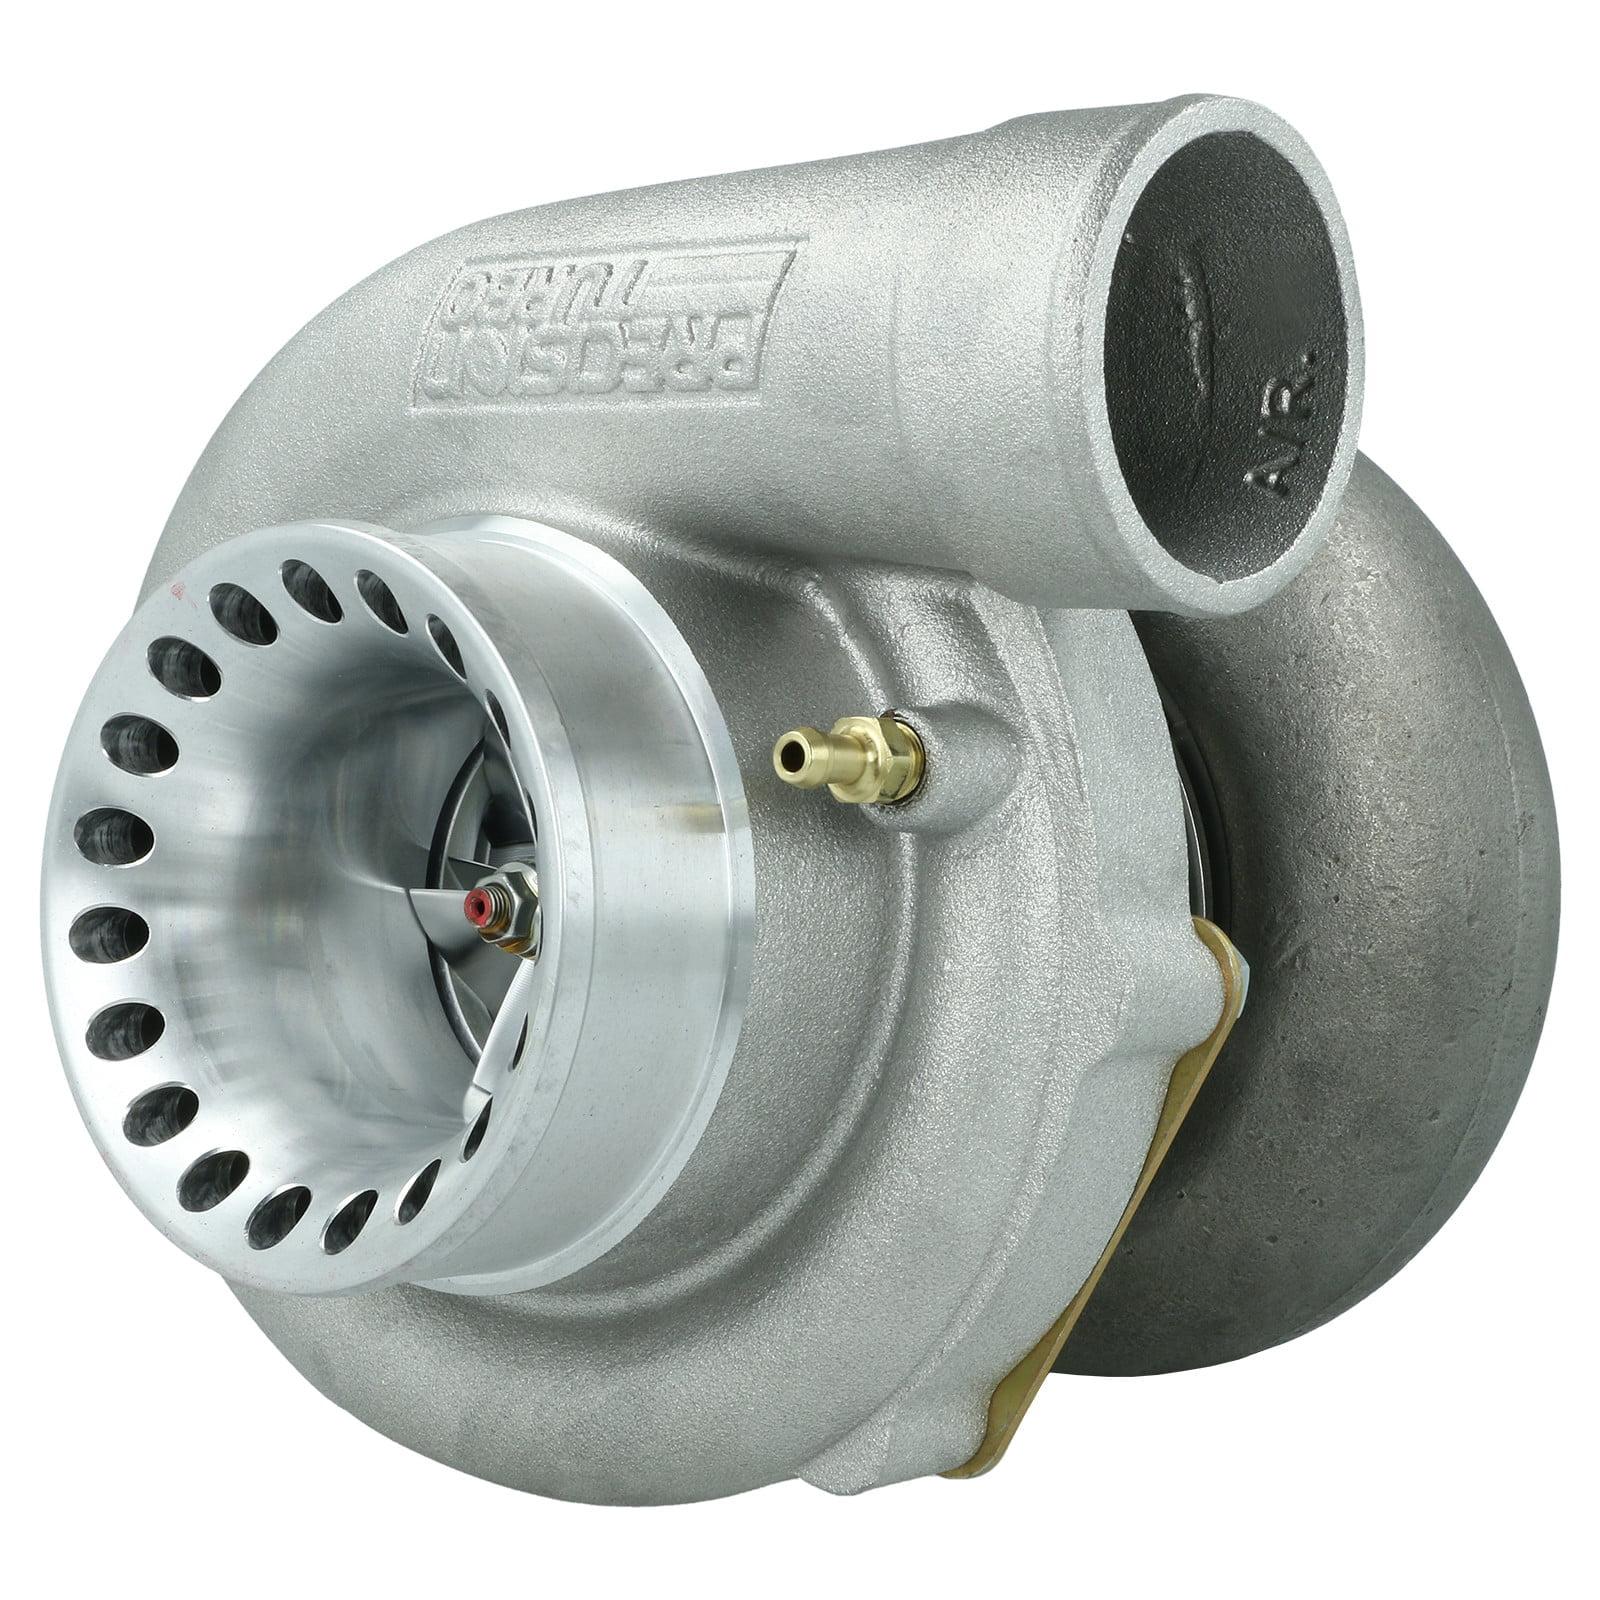 pt-5866-turbocharger